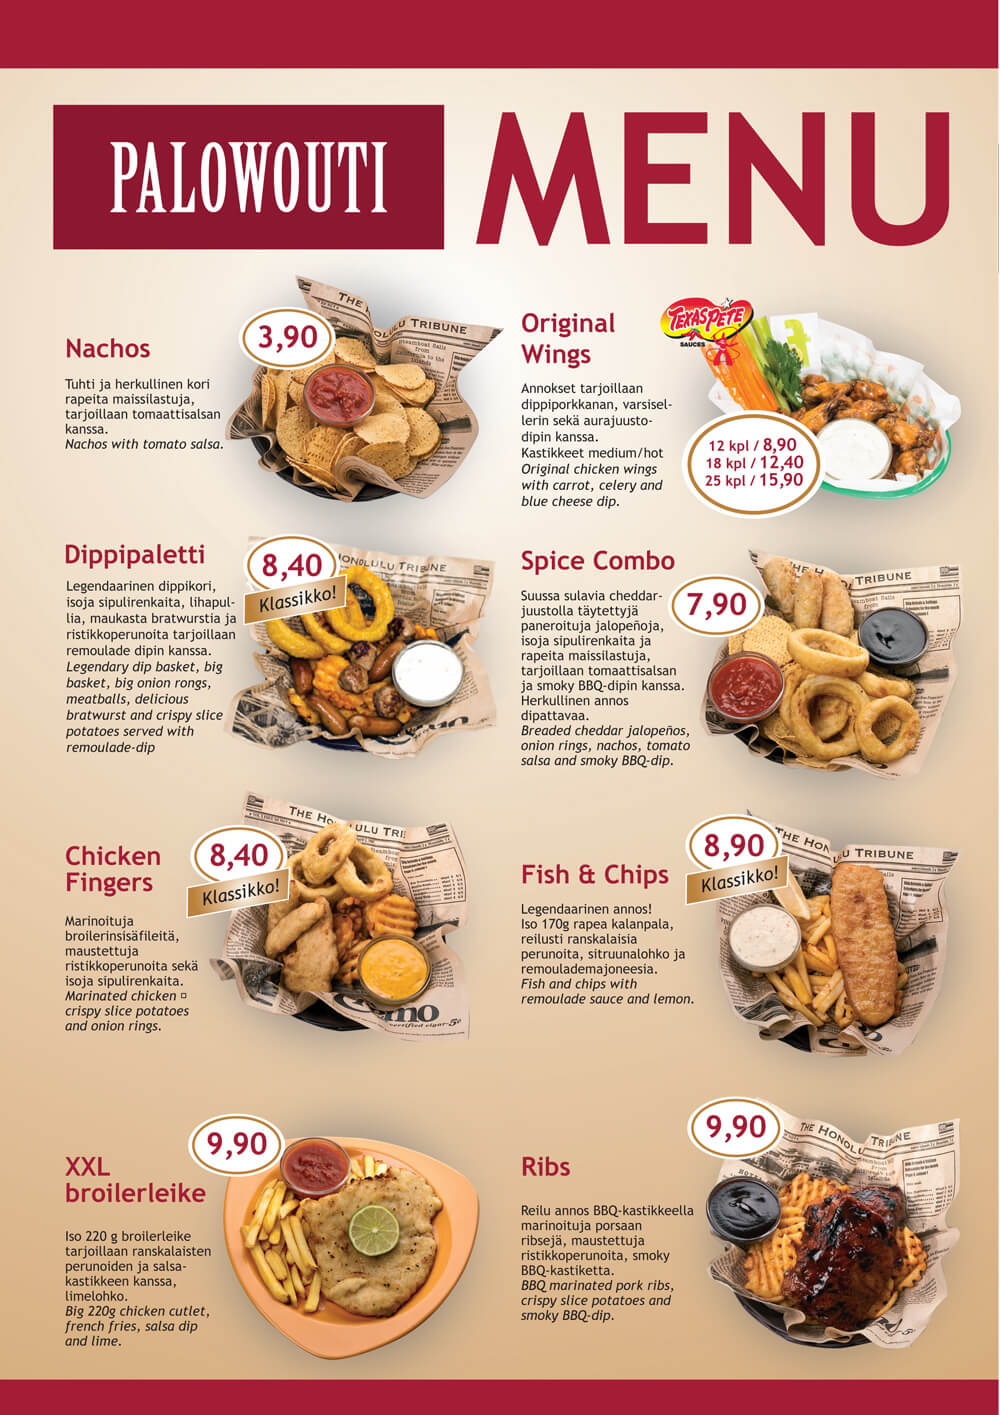 Palowoudin menu